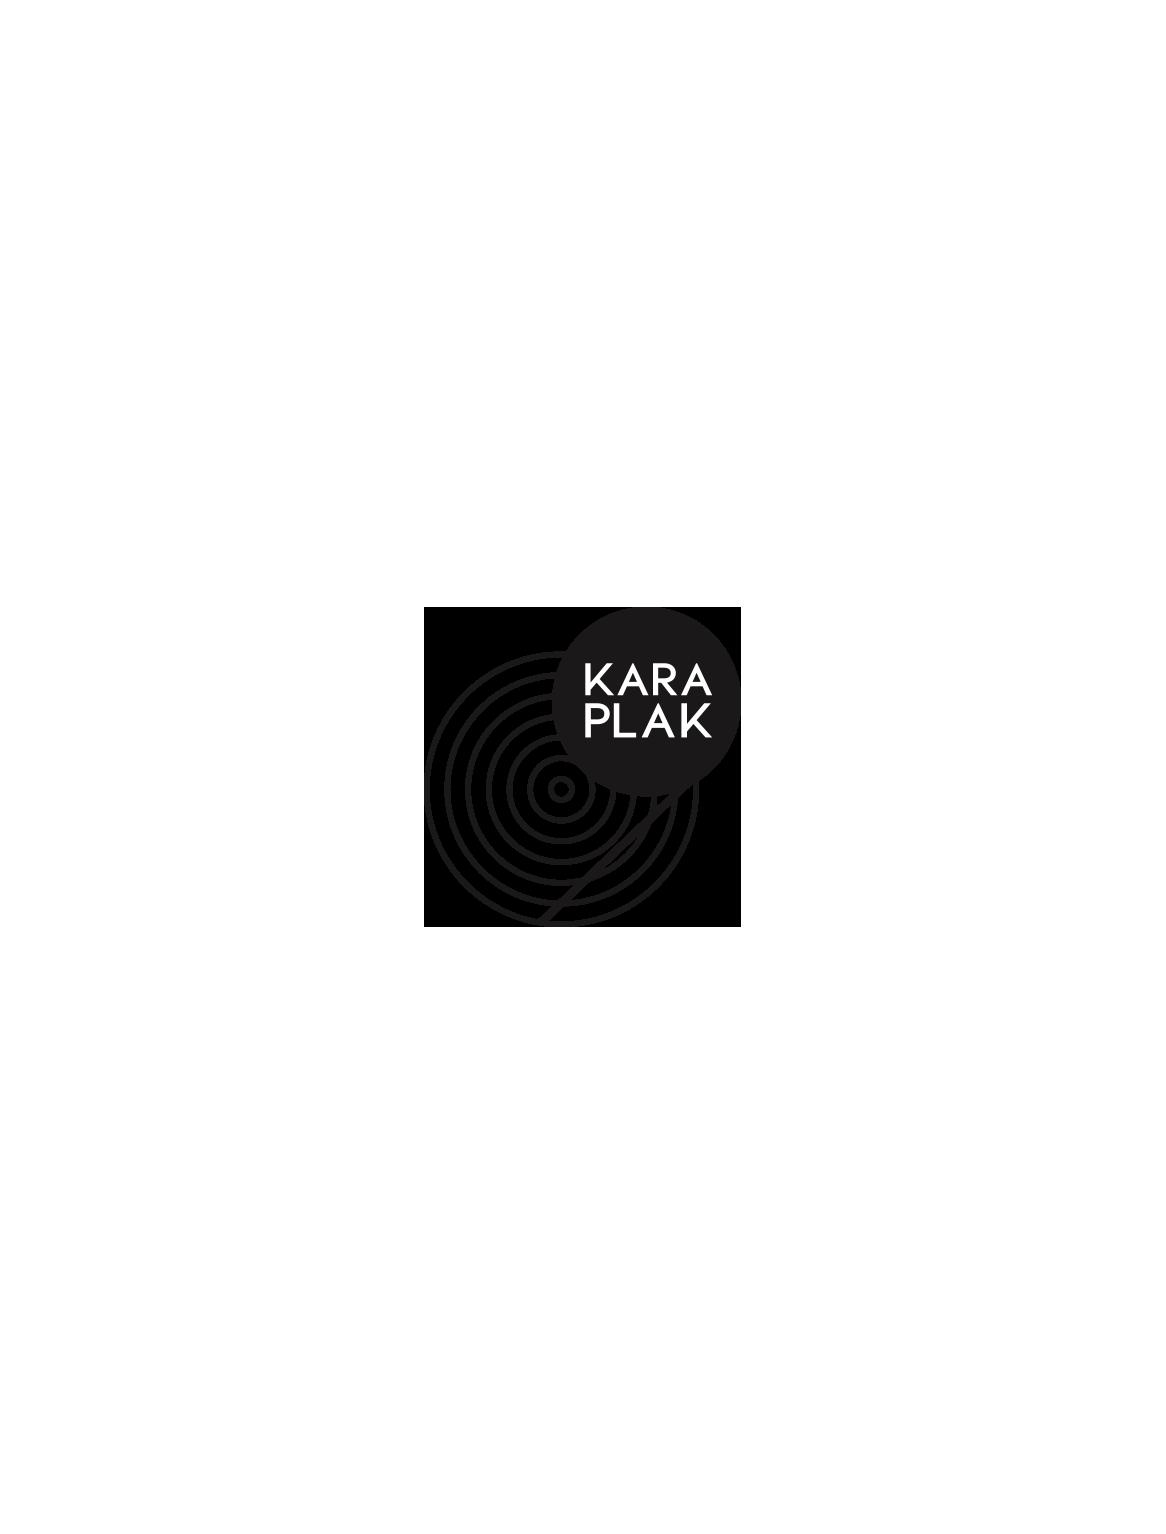 Logo for Kara Plak Publishing, 2015.